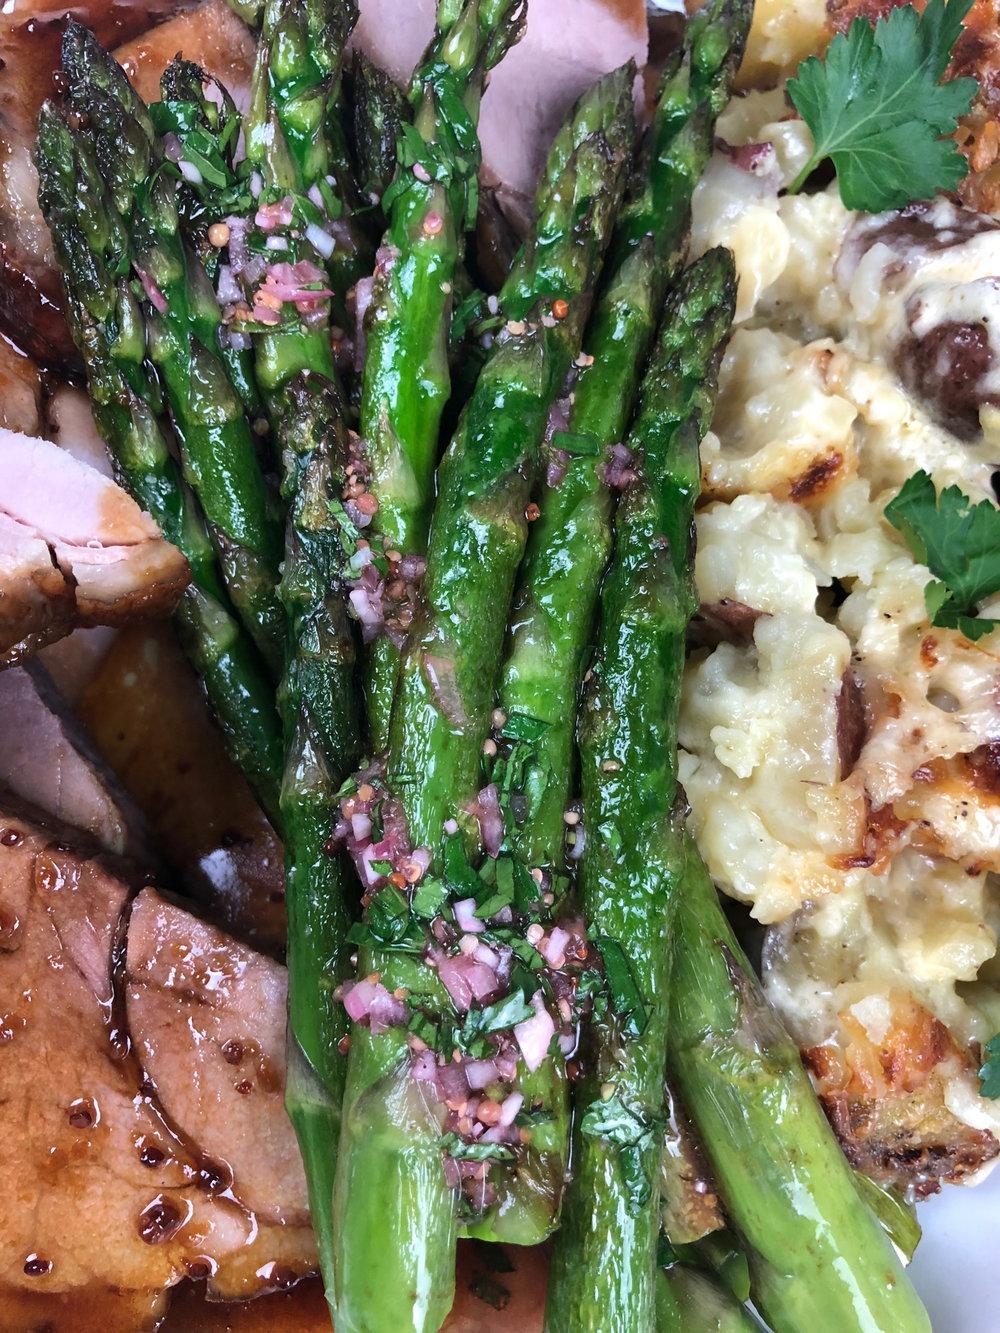 Asparagus with Blood Orange Vinaigrette, served with Broad Arrow Farm  Smoked Ham  and Smashed Potatoes Au Gratin.